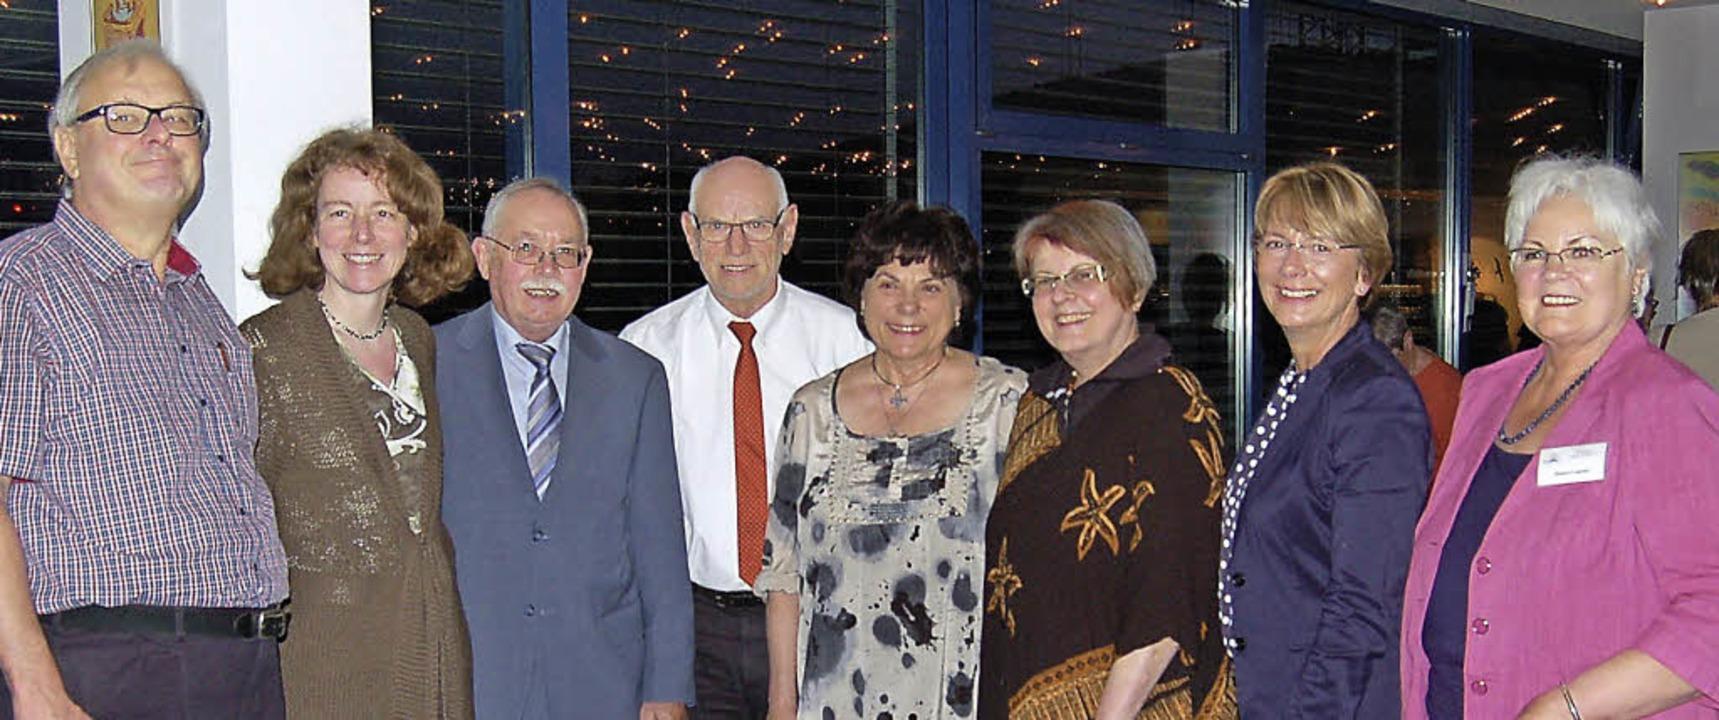 Der Vorstand des Förderkreises Hospiz am Buck   | Foto: Tamara Keller